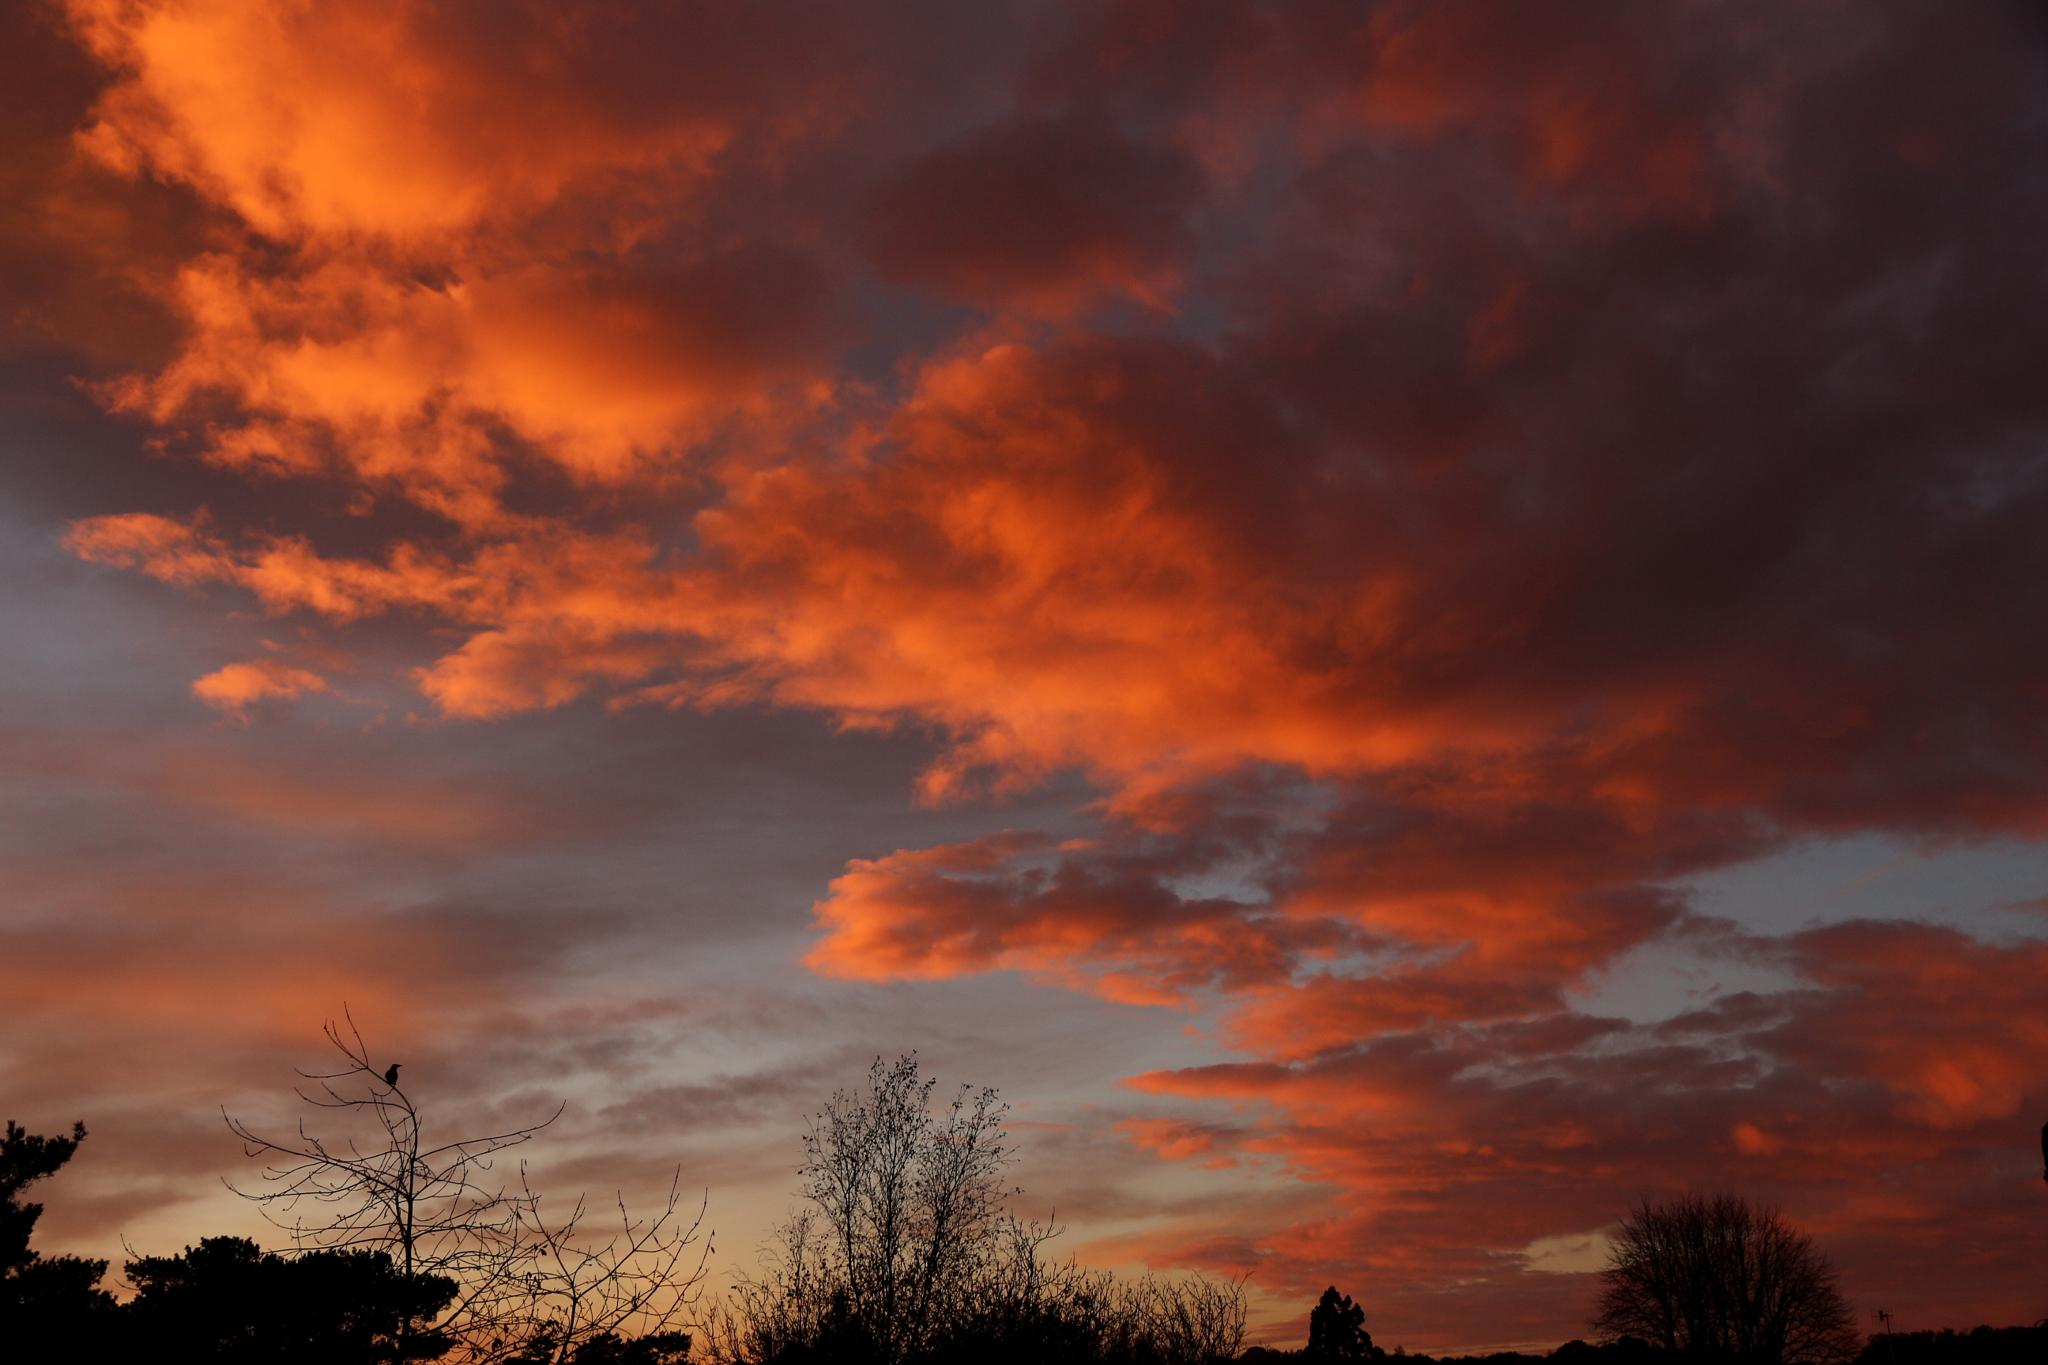 Crow at Dawn 2 by Jon Franks